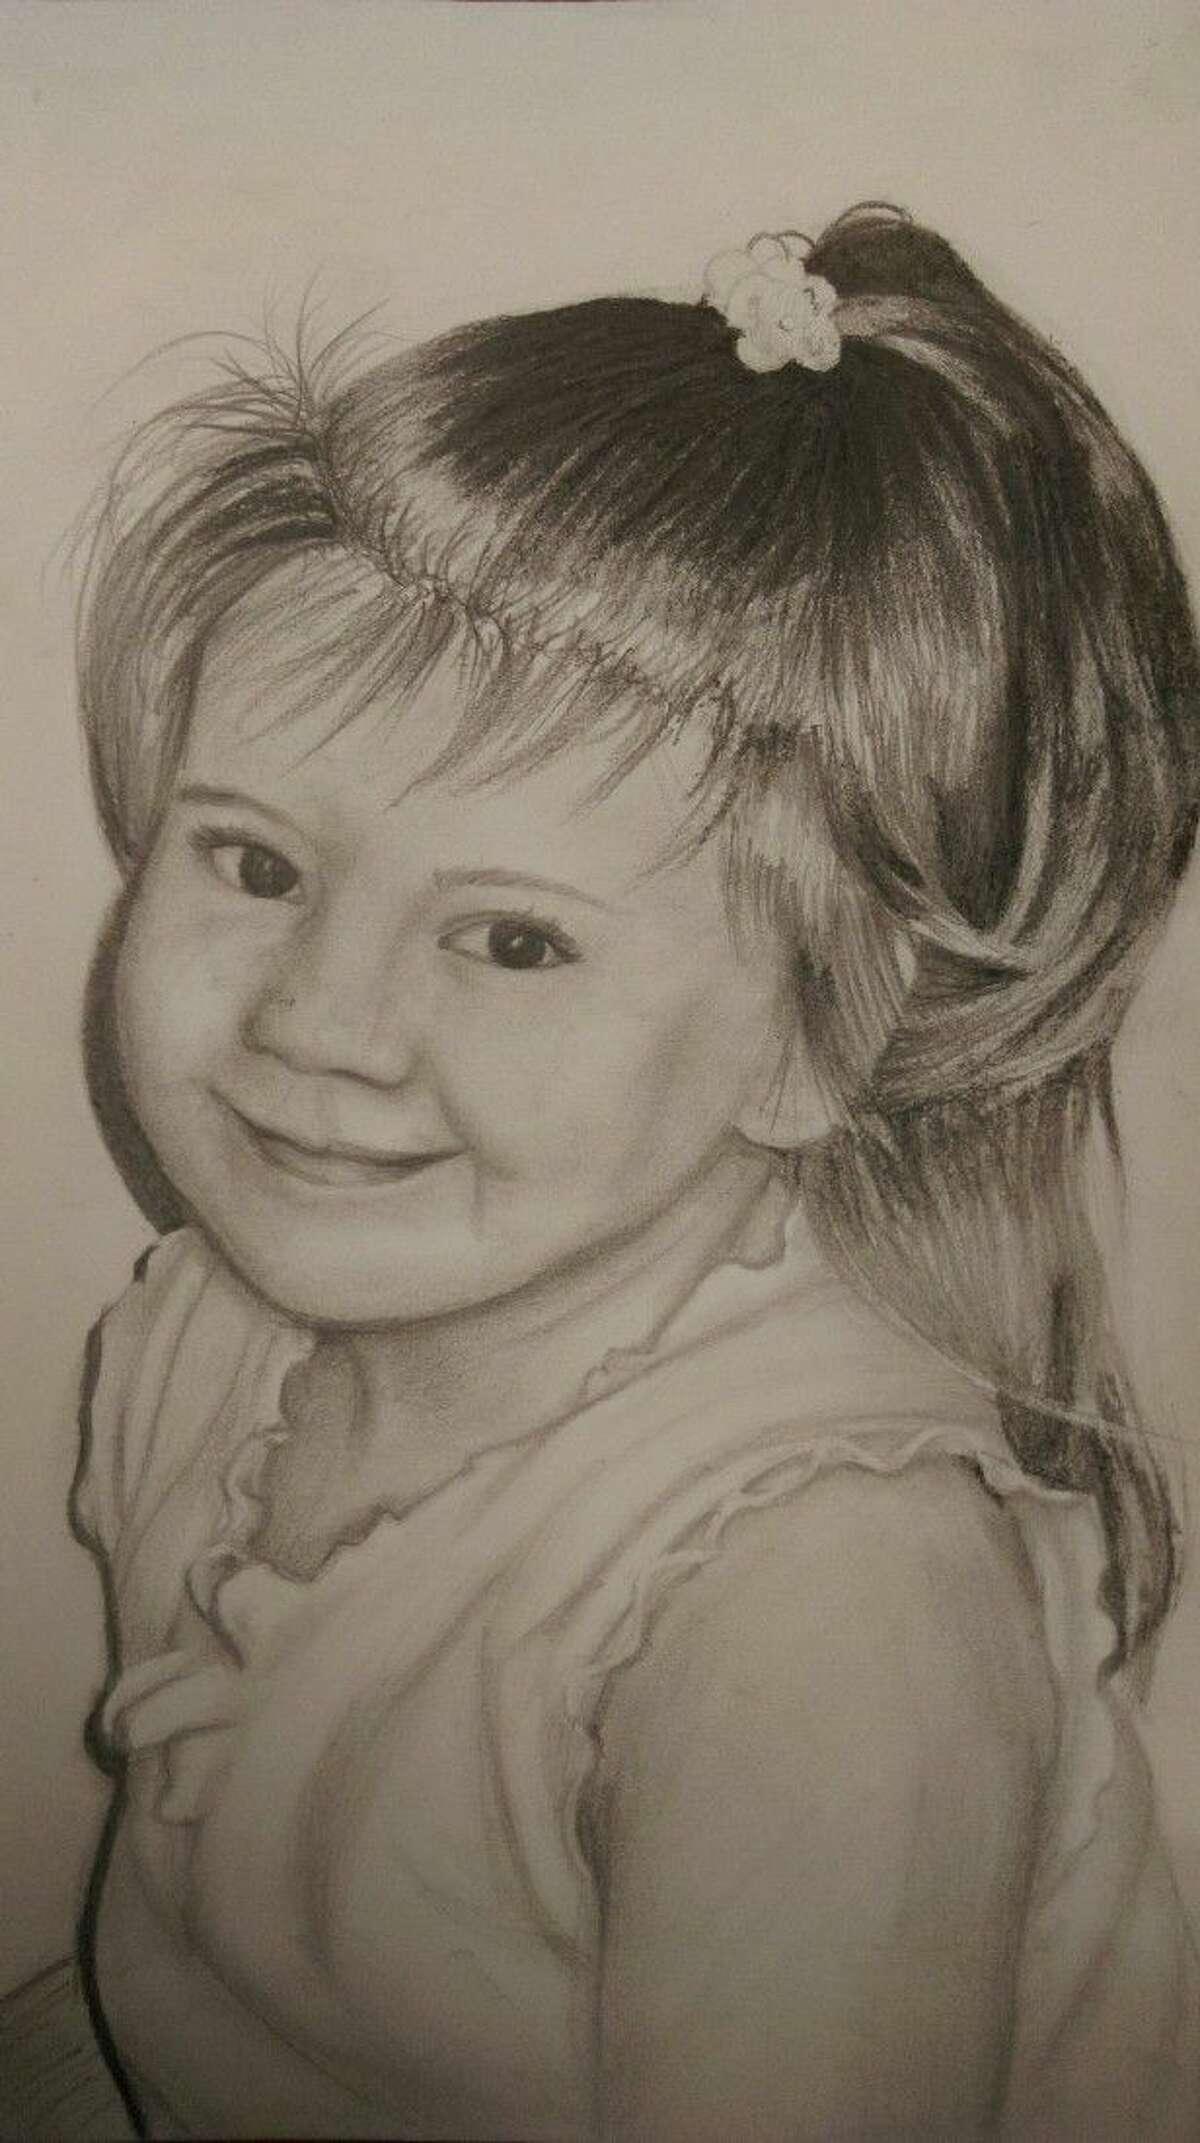 Innocence Drawing & Illustration by Madison Keller, Kingwood Park High School; Instructor: Melanie Hunt.